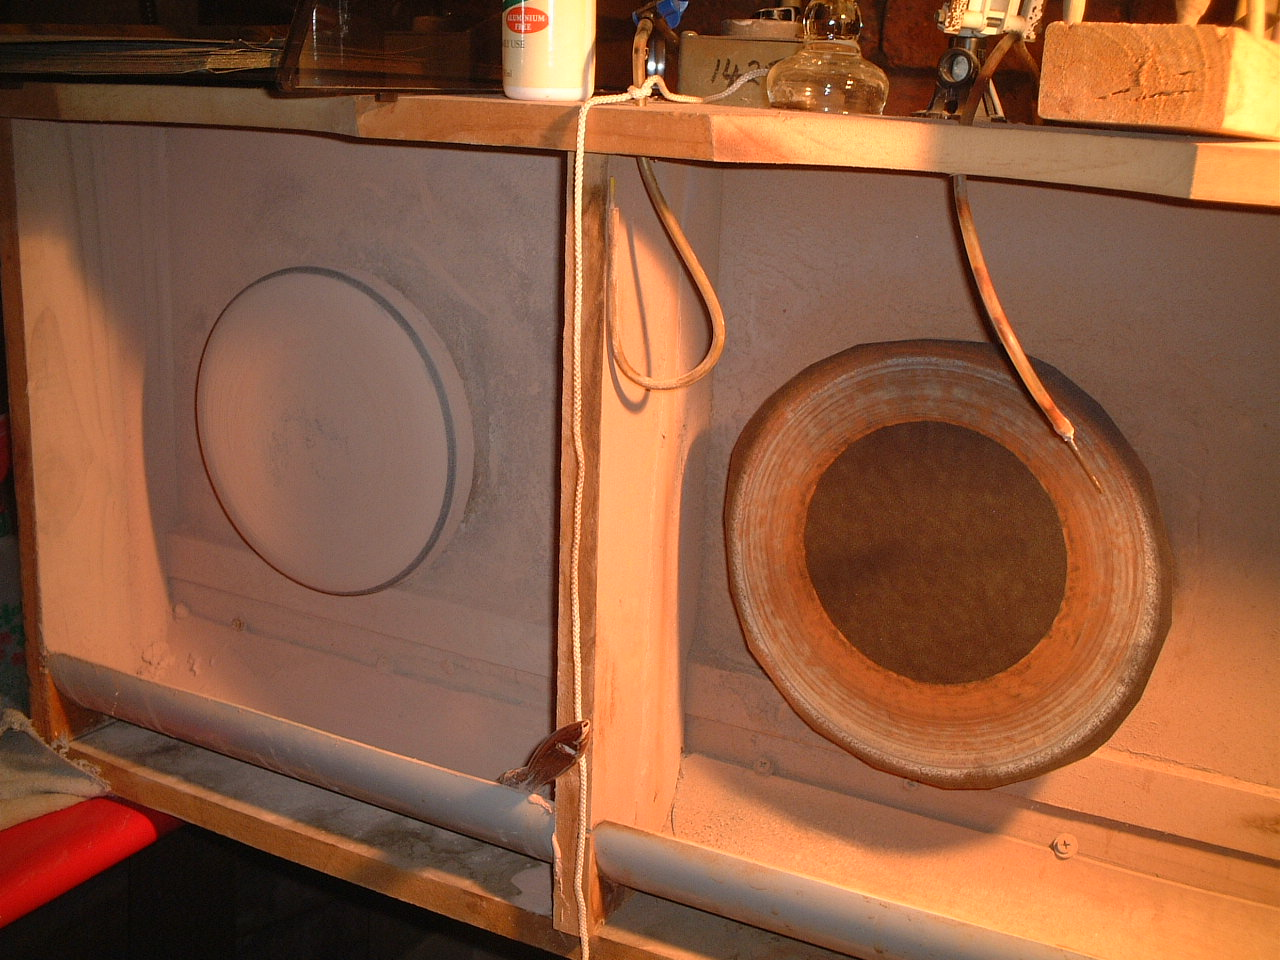 sanding and polishing machine for opal